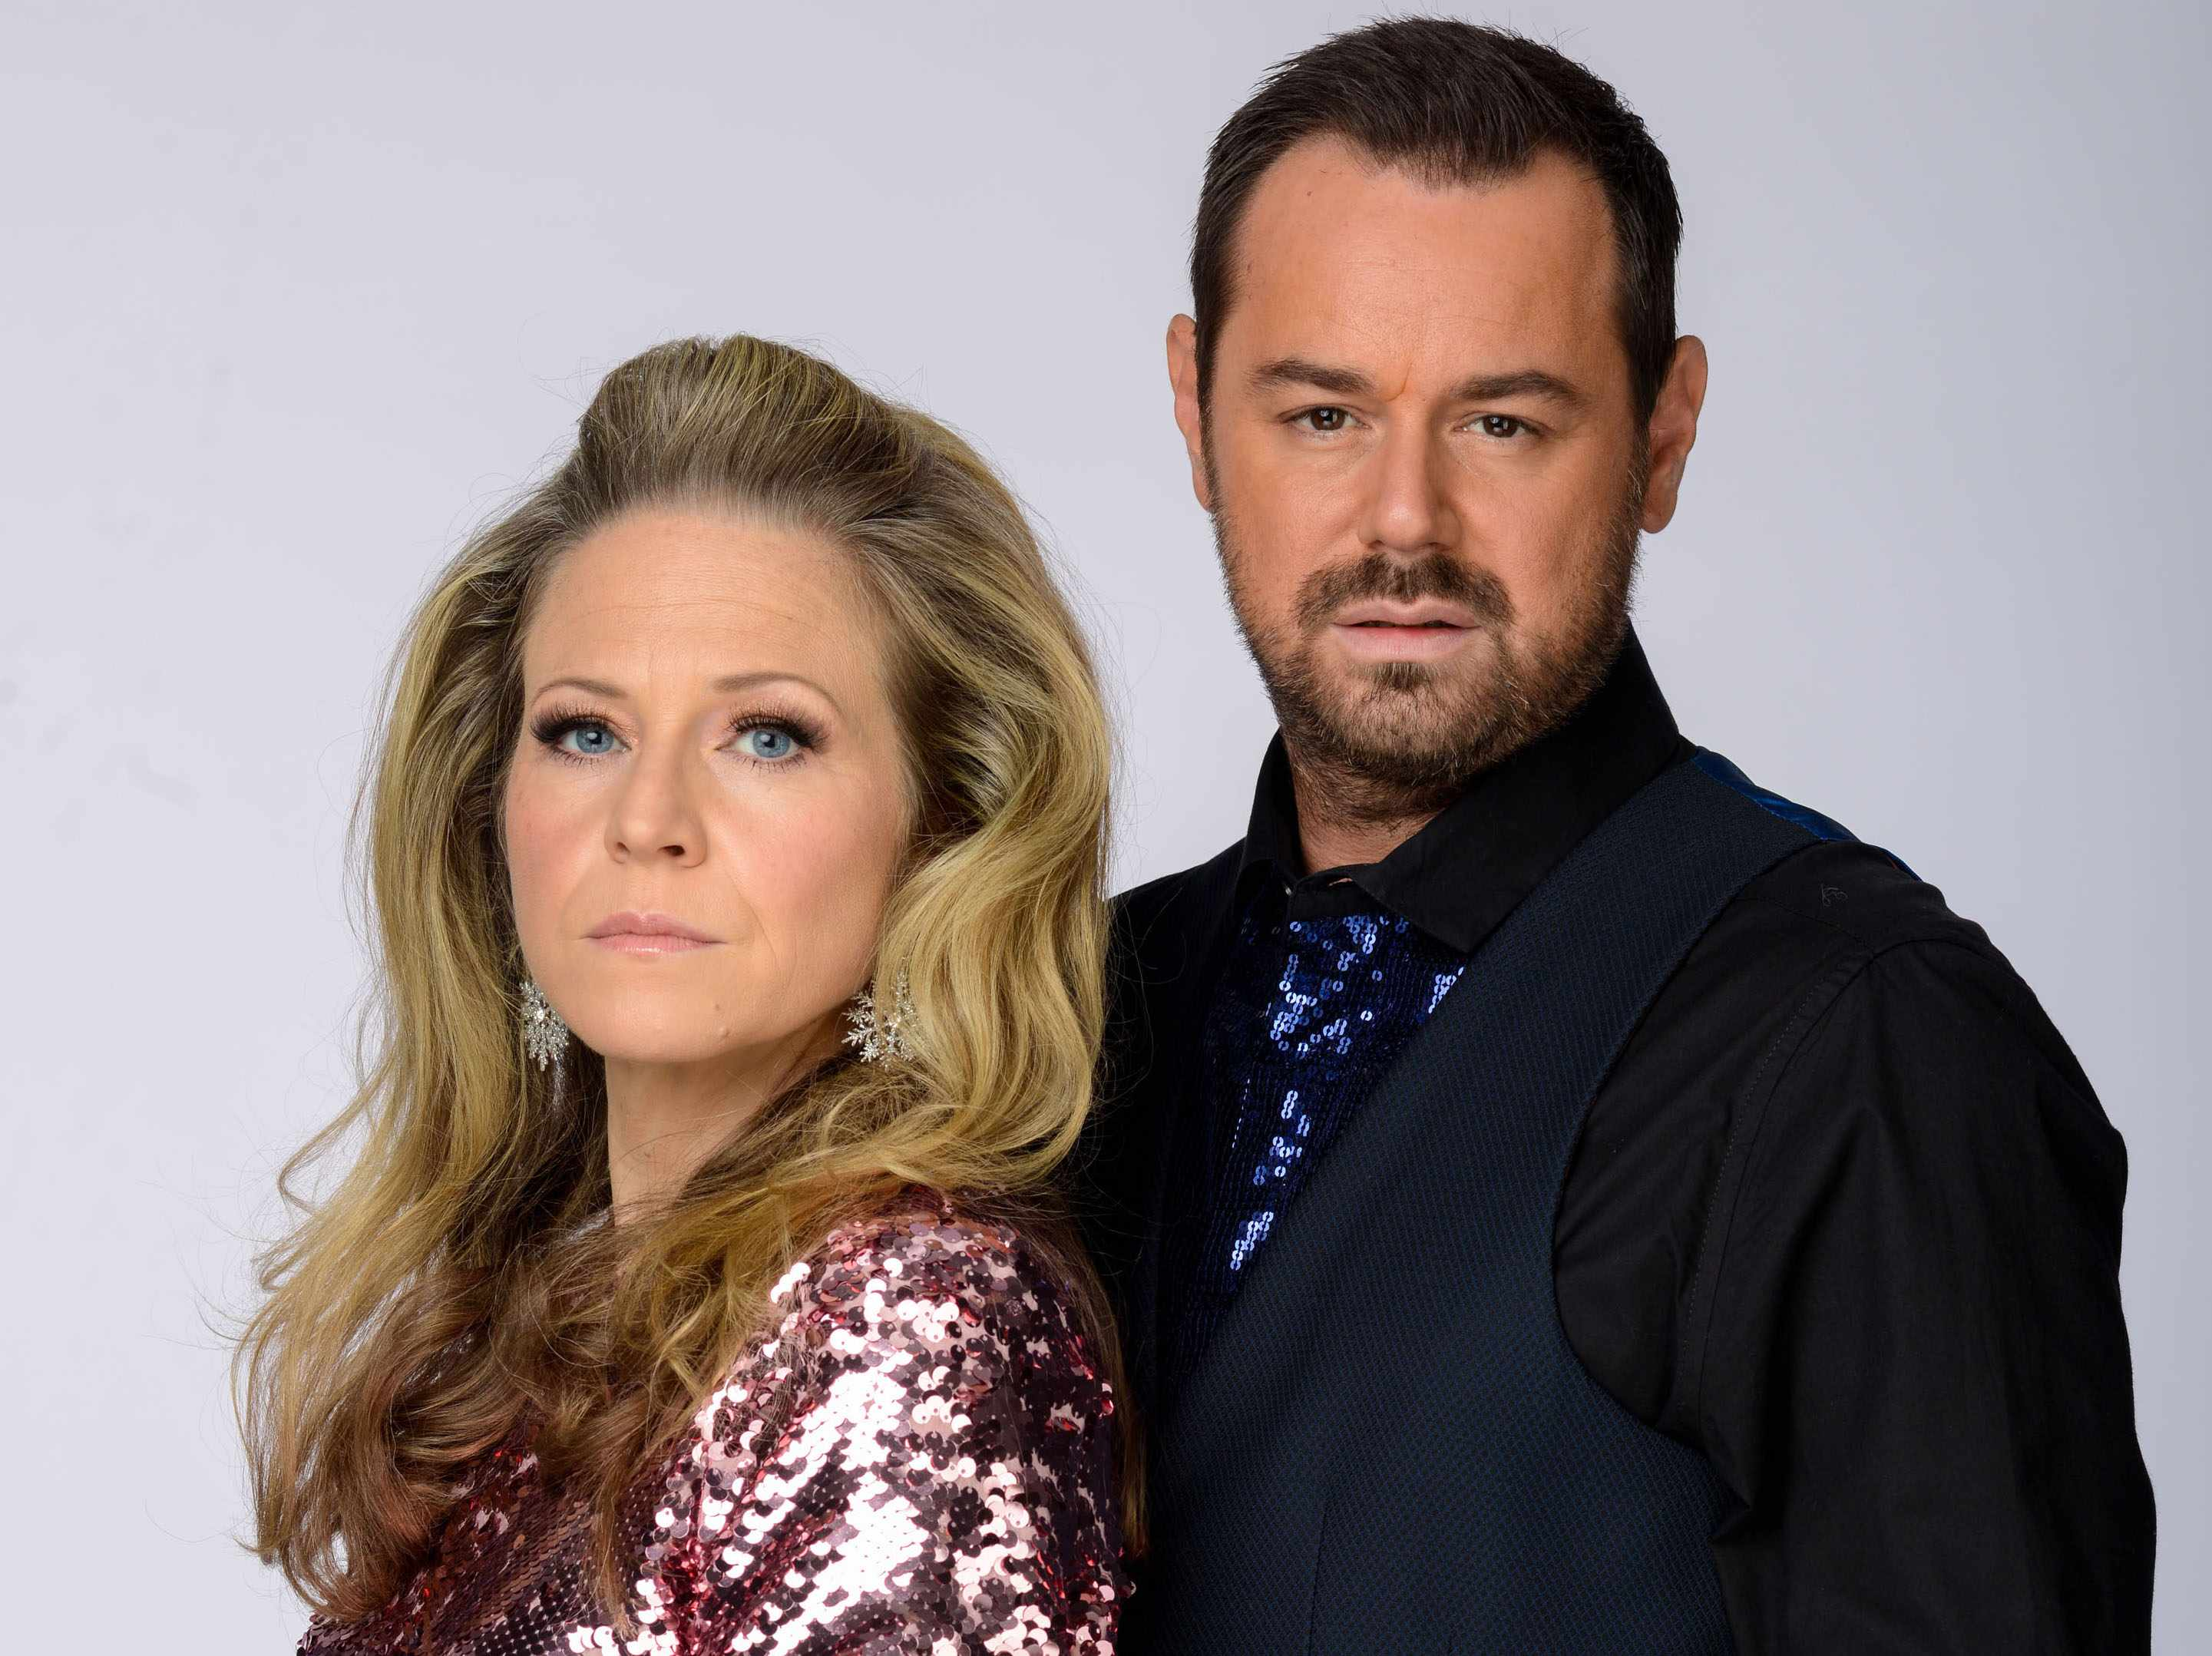 Linda (Kellie Bright) and Mick (Danny Dyer) on EastEnders